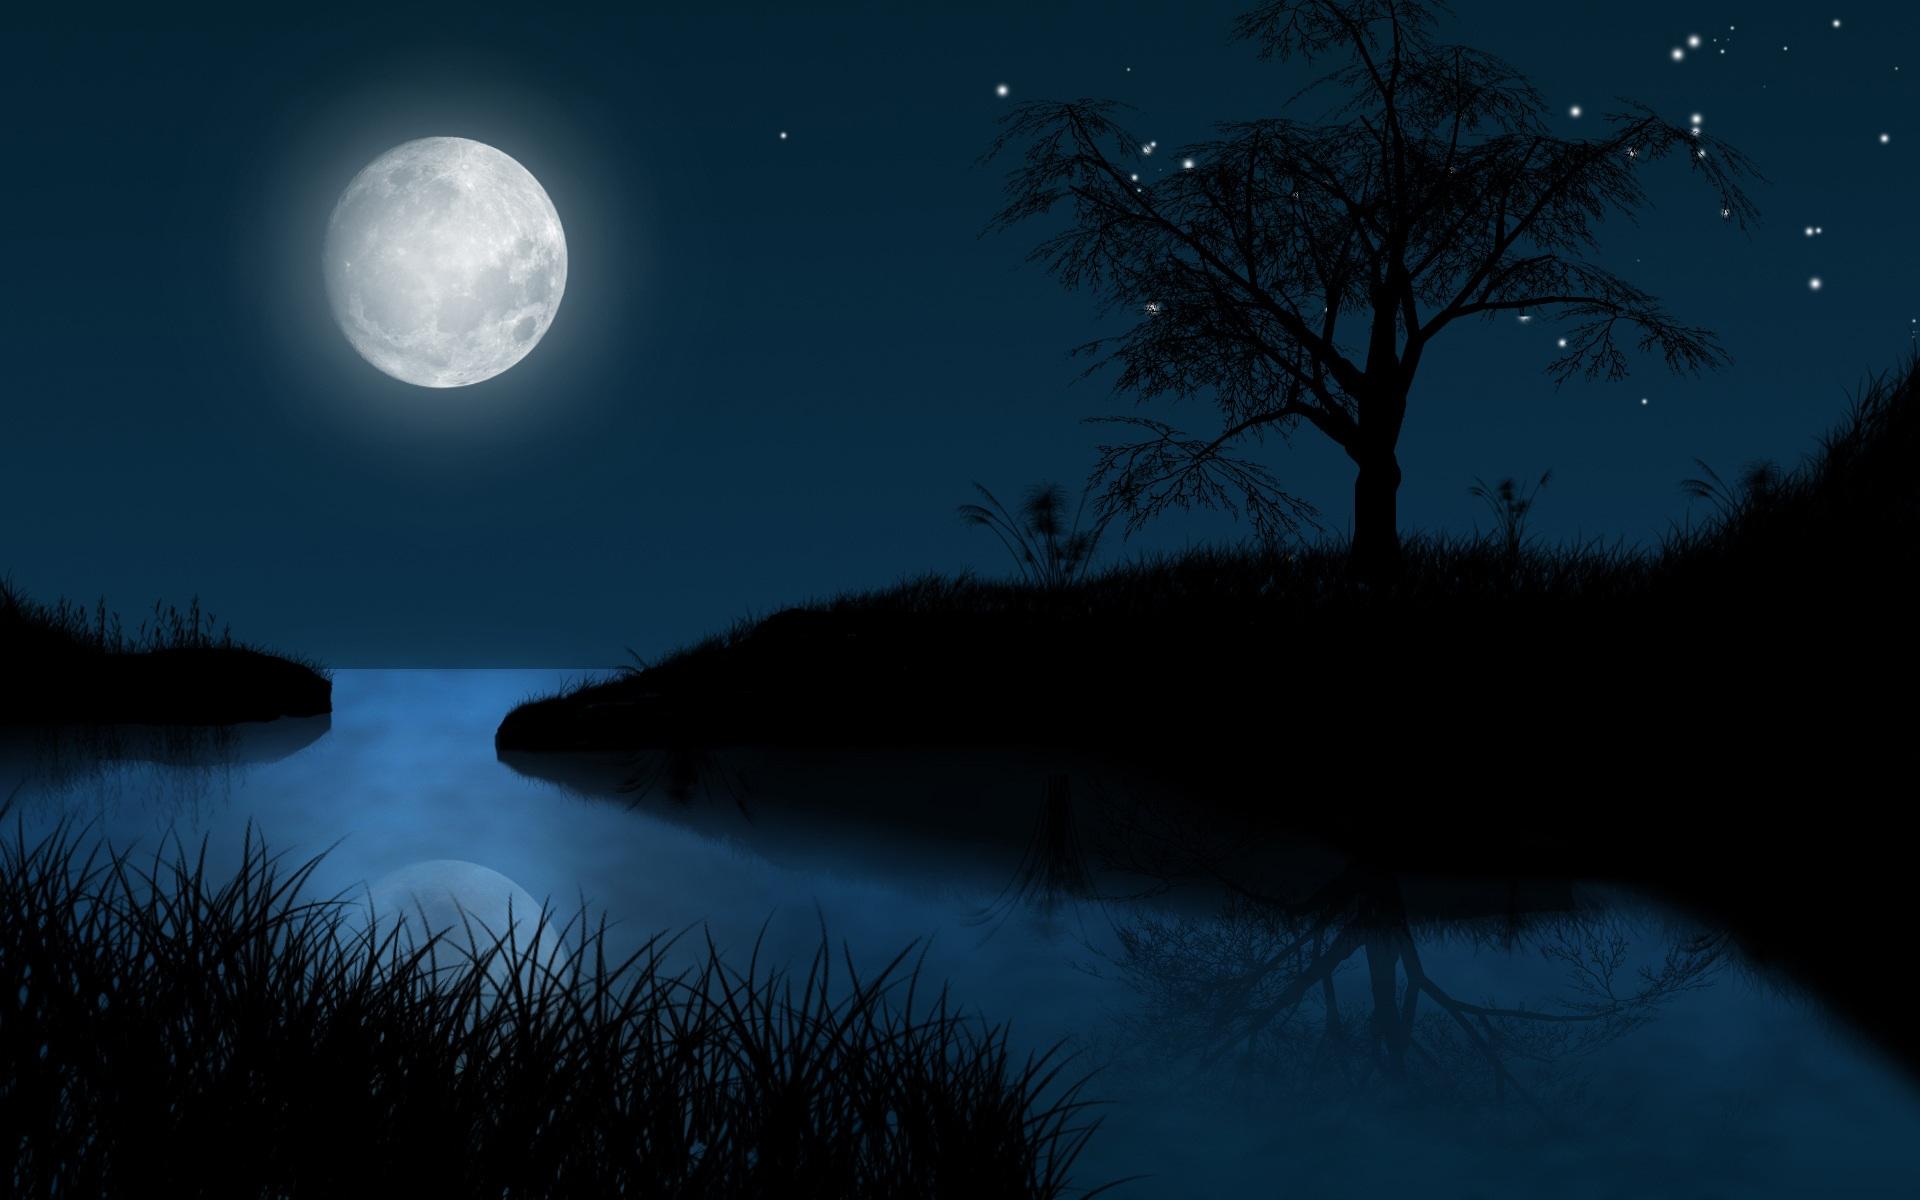 Night clipart full moon night. Panda free images